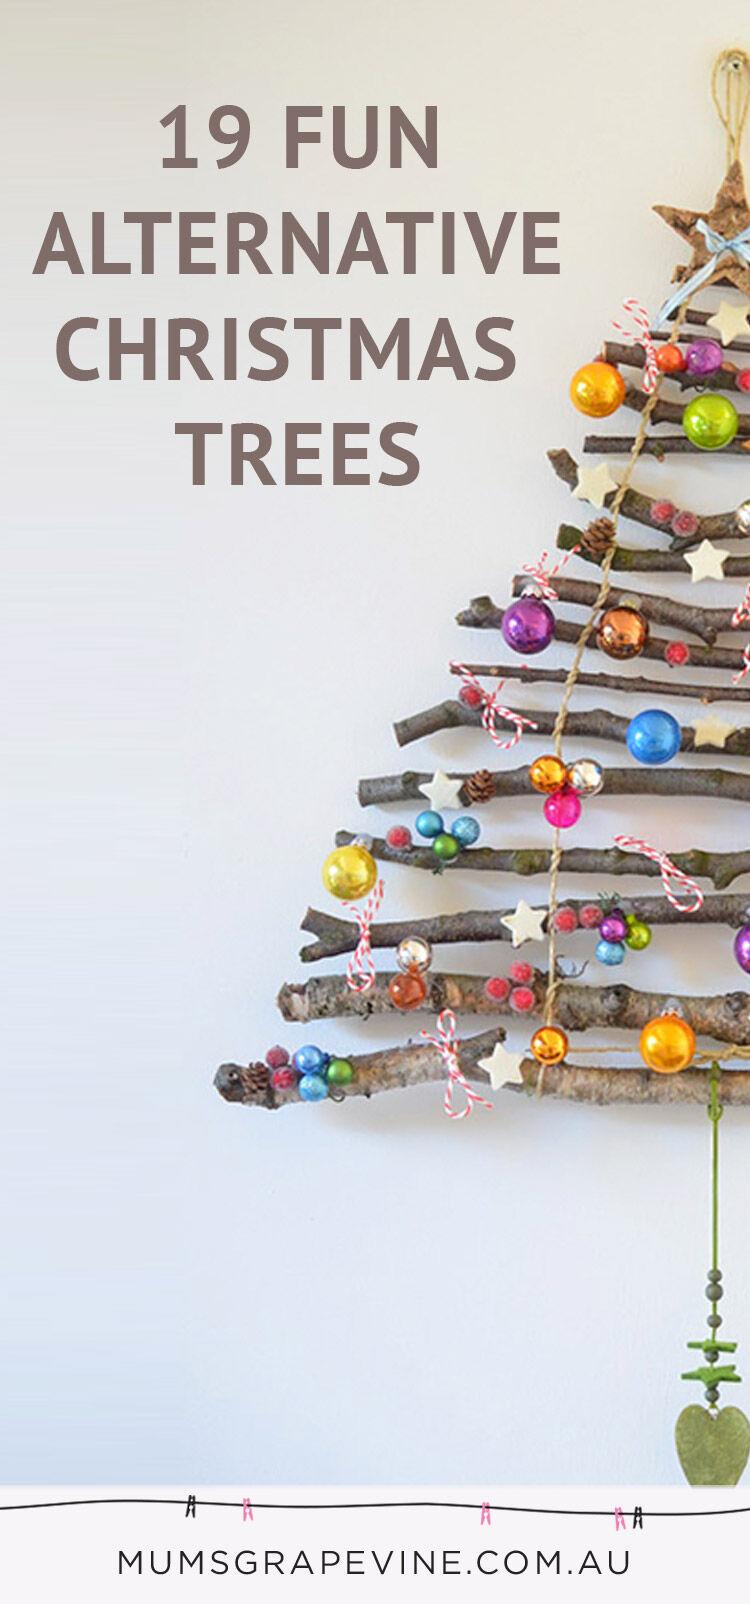 19 Alternative Christmas Trees